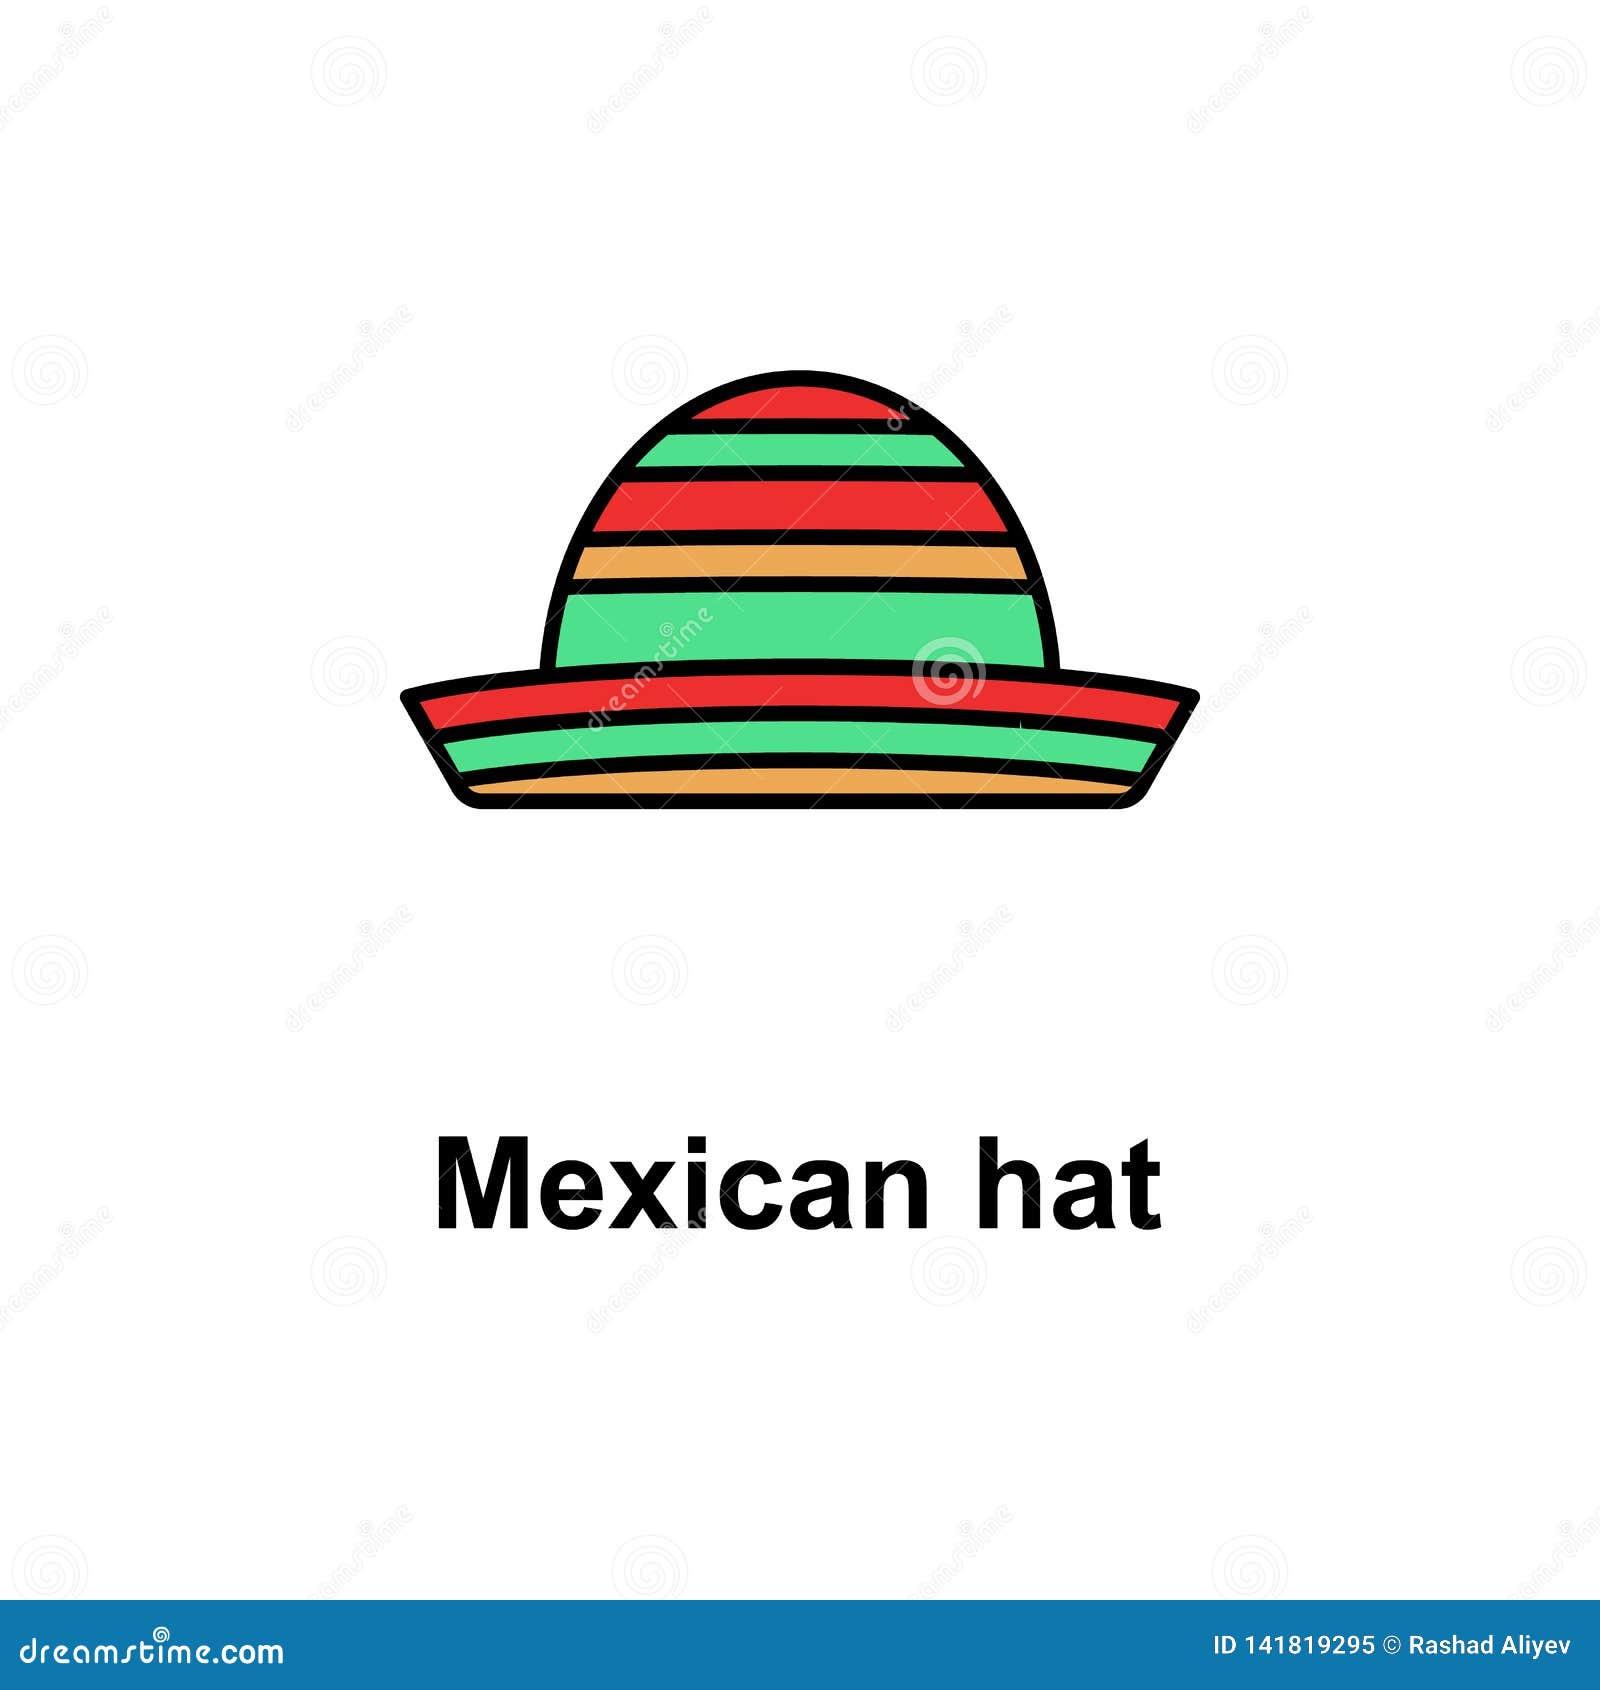 Mexican hat icon. Element of Cinco de Mayo color icon. Premium quality graphic design icon. Signs and symbols collection icon for